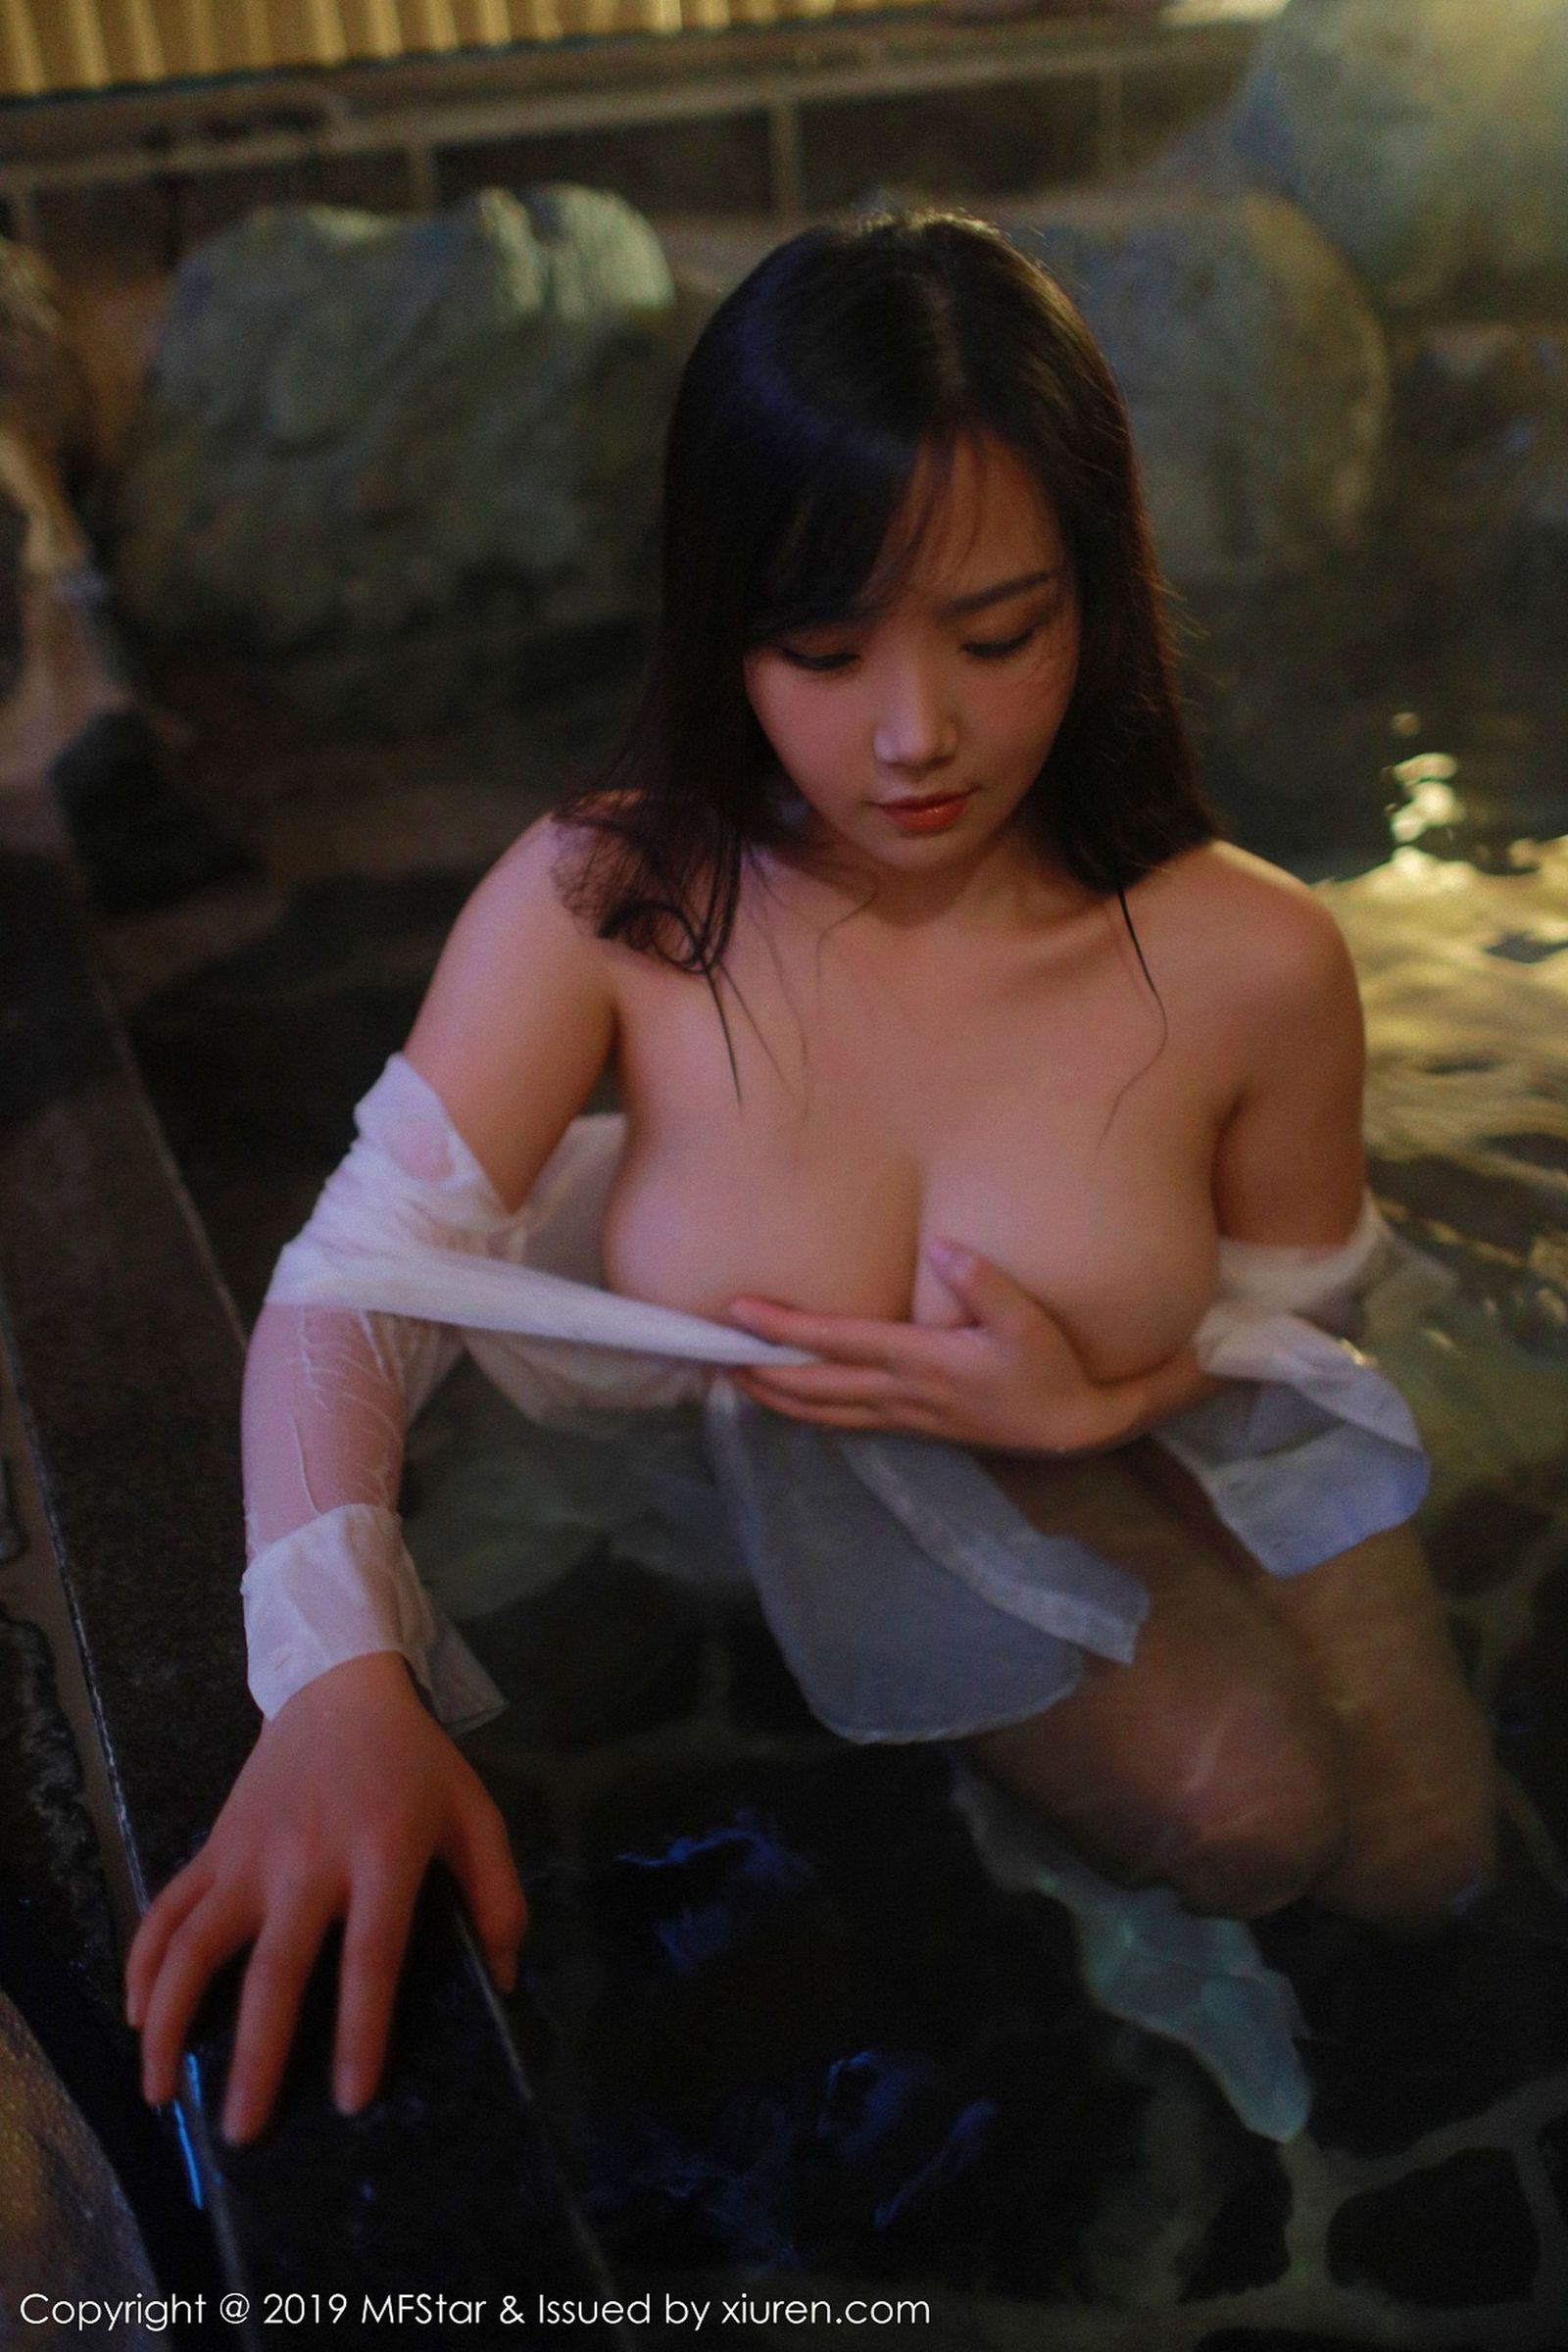 [MFStar模范学院] Vol.176 女神@徐微微miar日本旅拍第二套[38P]